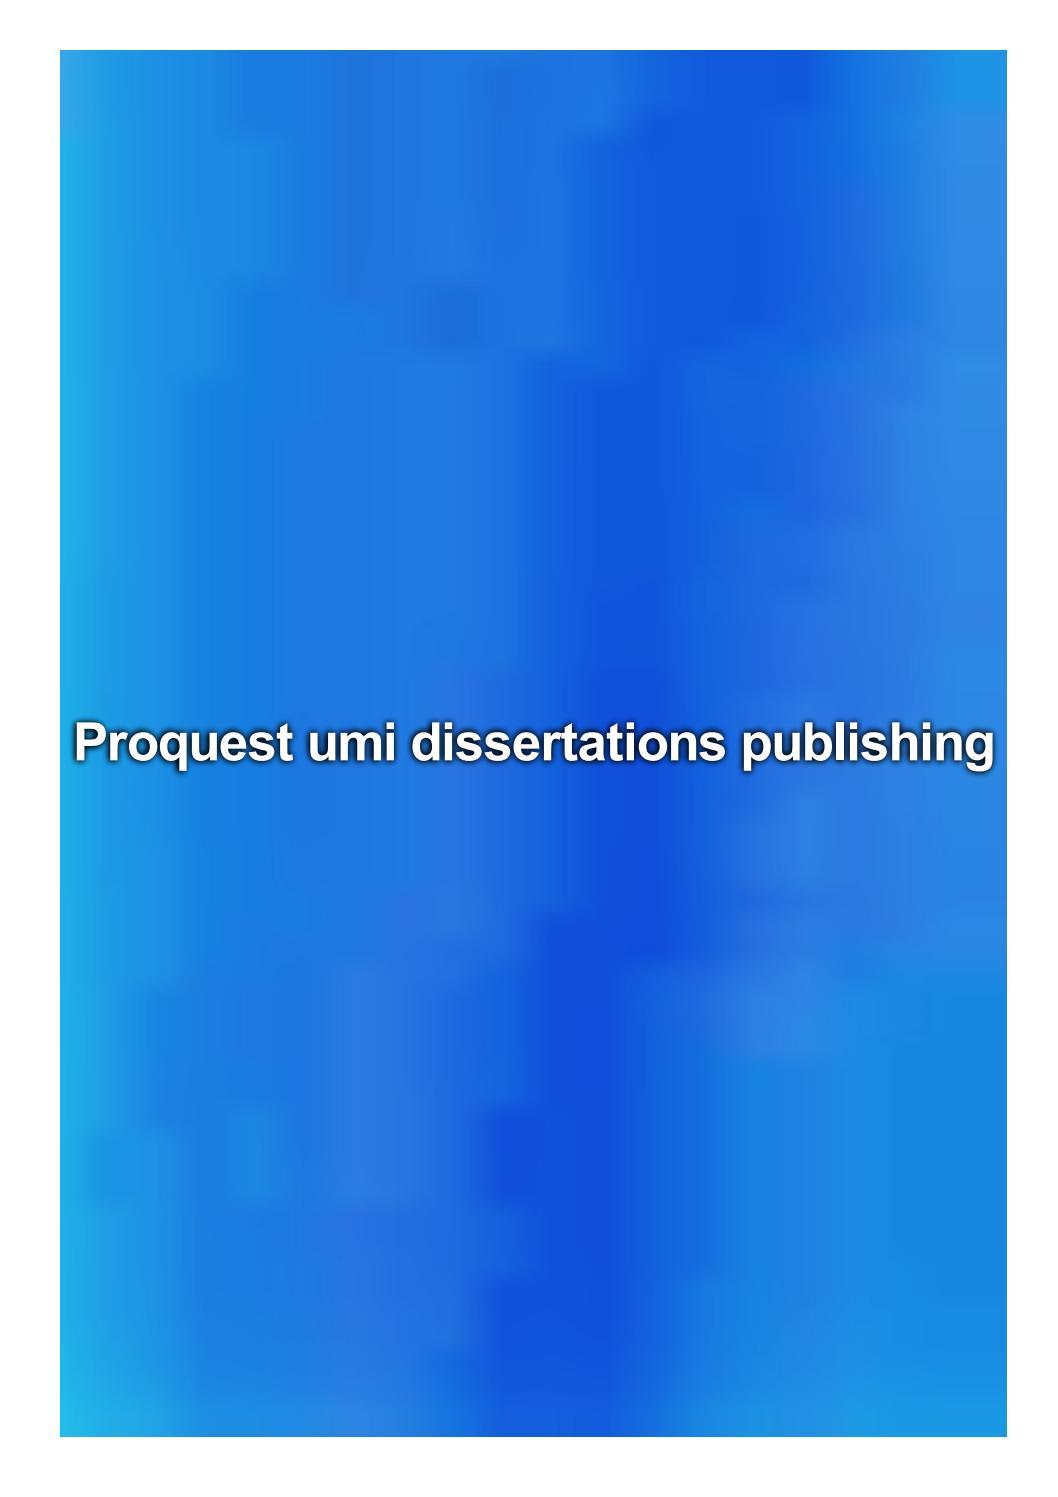 Umi dissertations publishing template for dissertation